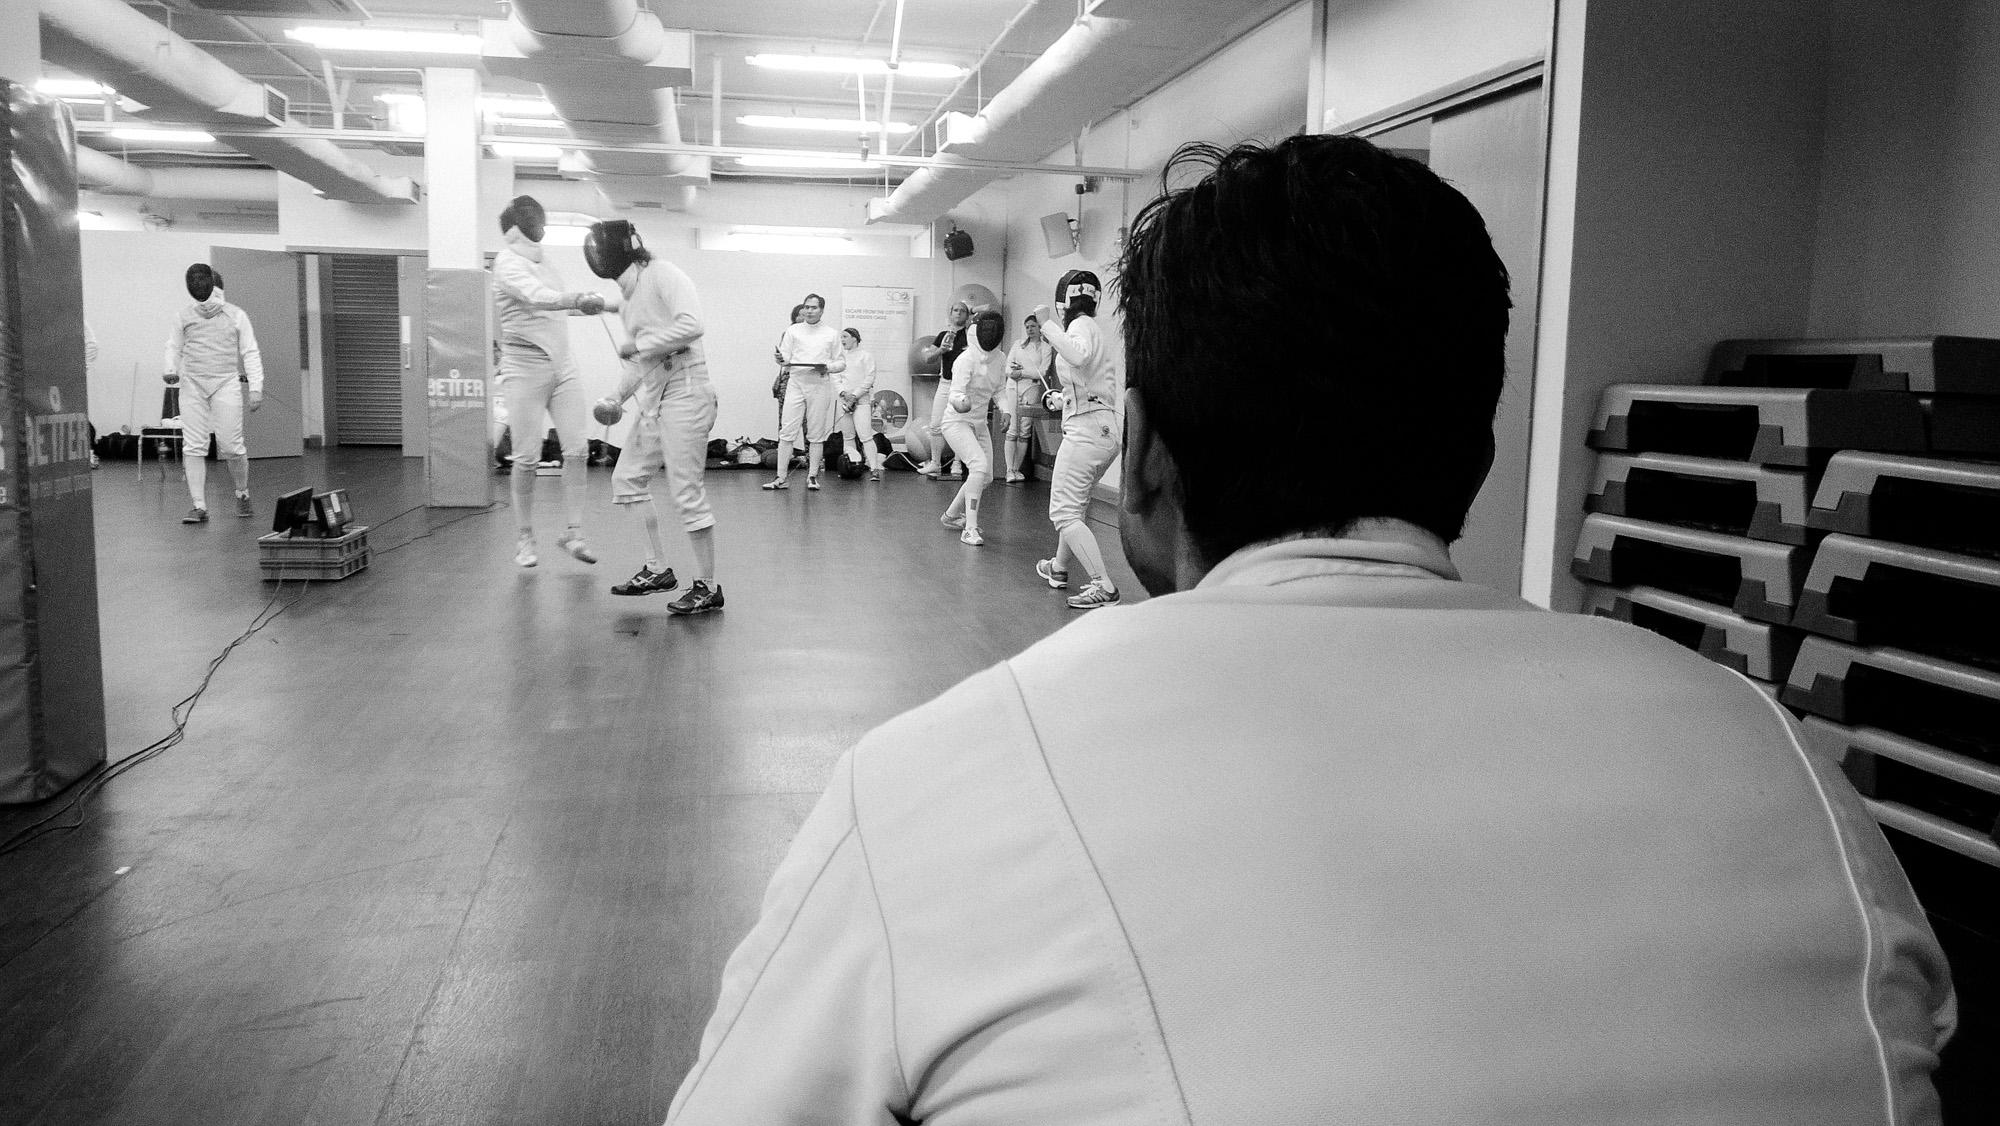 Fencing Tournament, London 2016